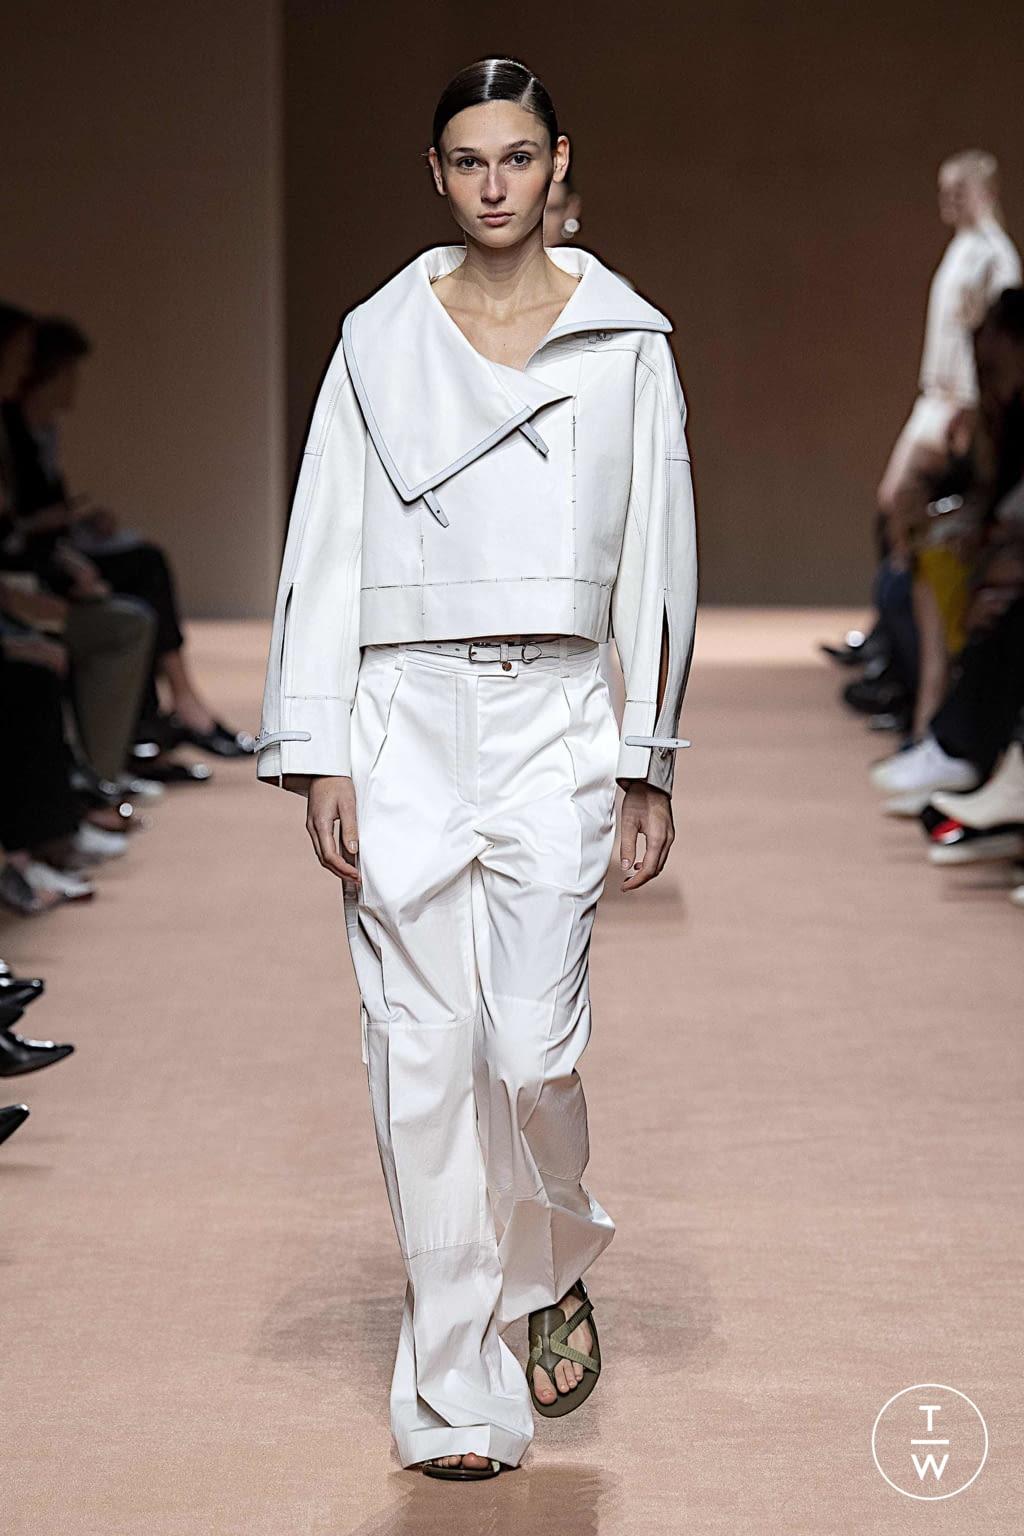 Abiti Da Sera Hermes.Hermes Ss20 Womenswear 44 The Fashion Search Engine Tagwalk